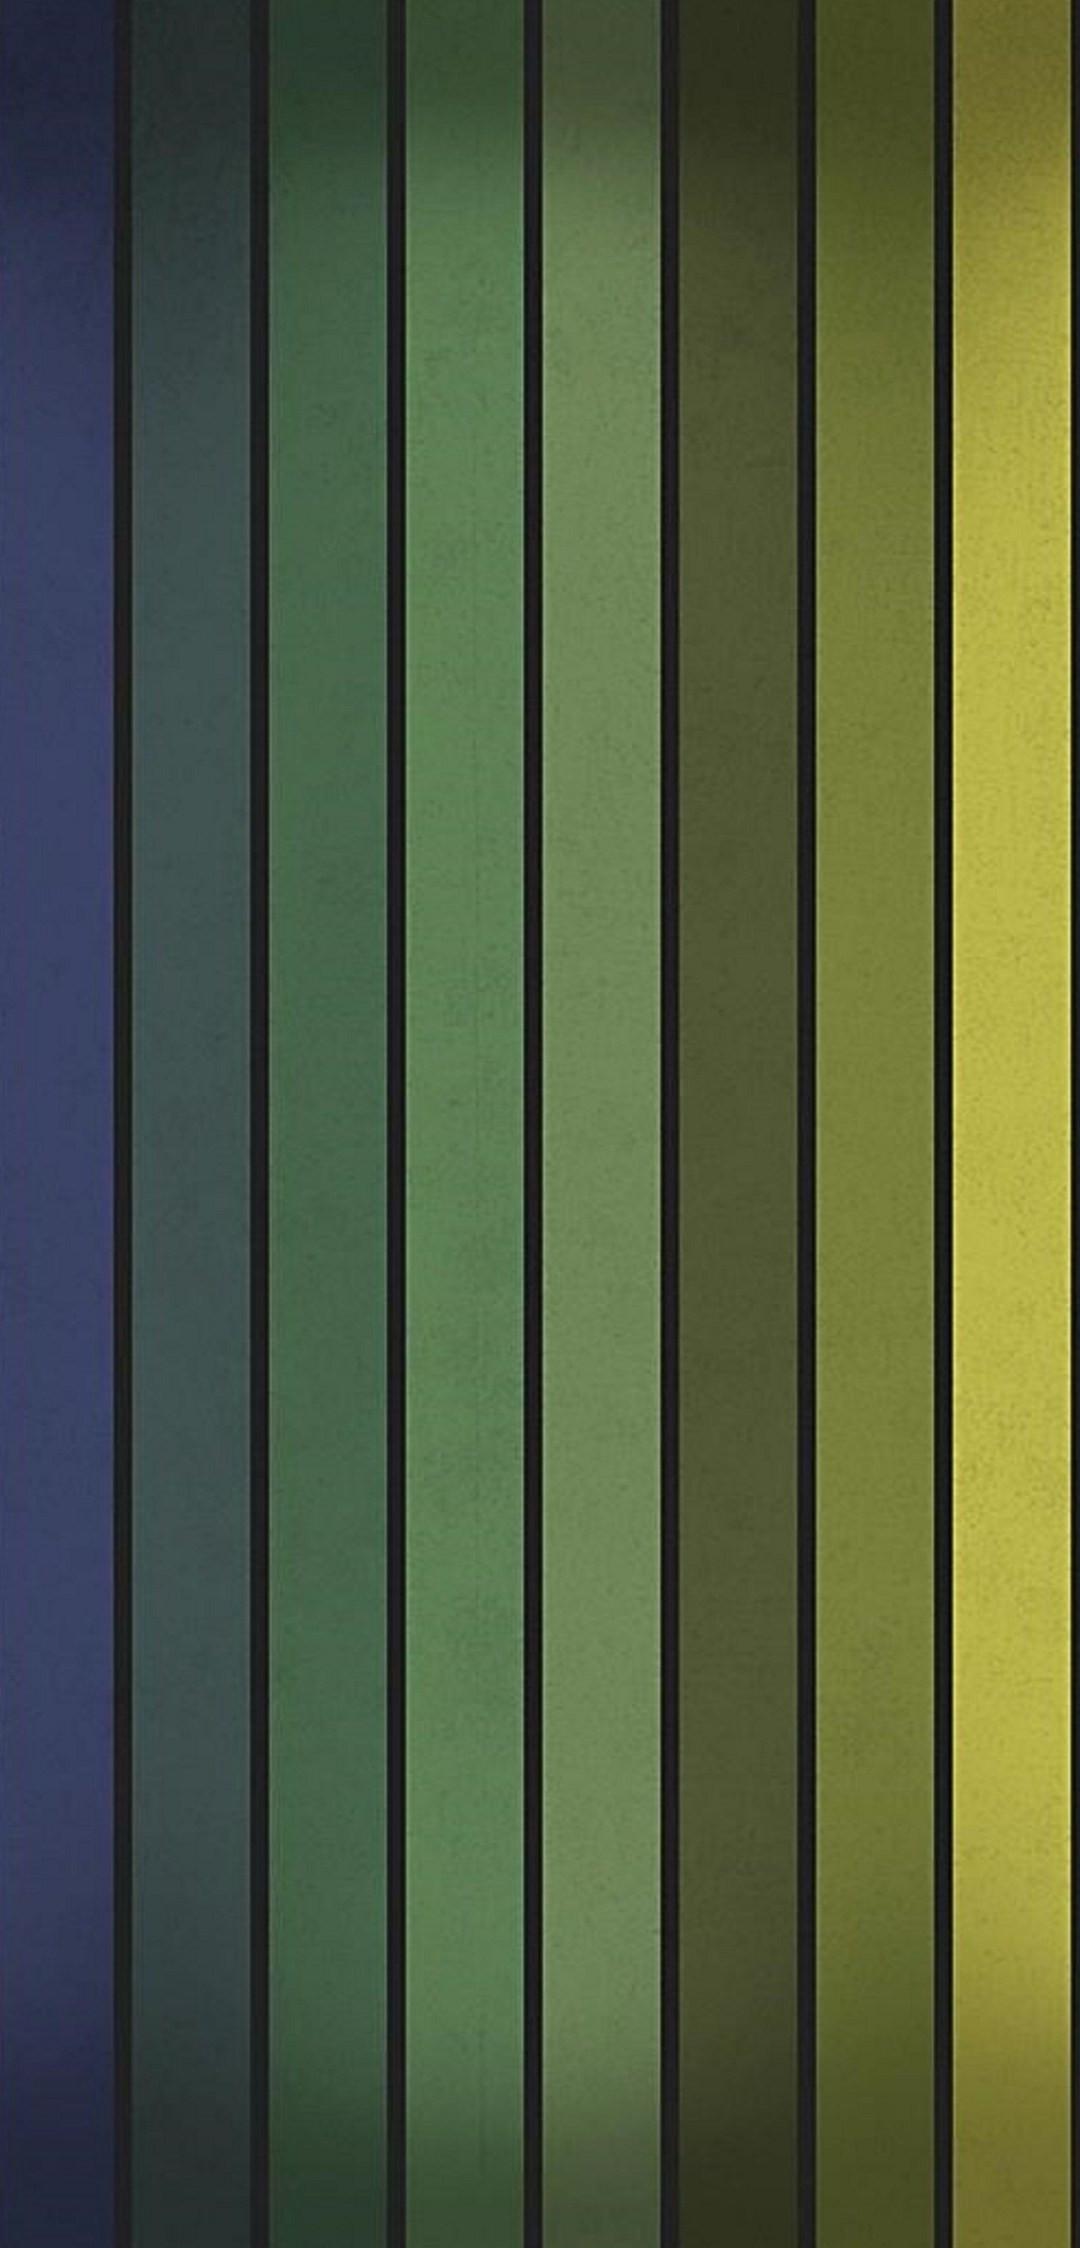 1080x2248 Background HD Wallpaper